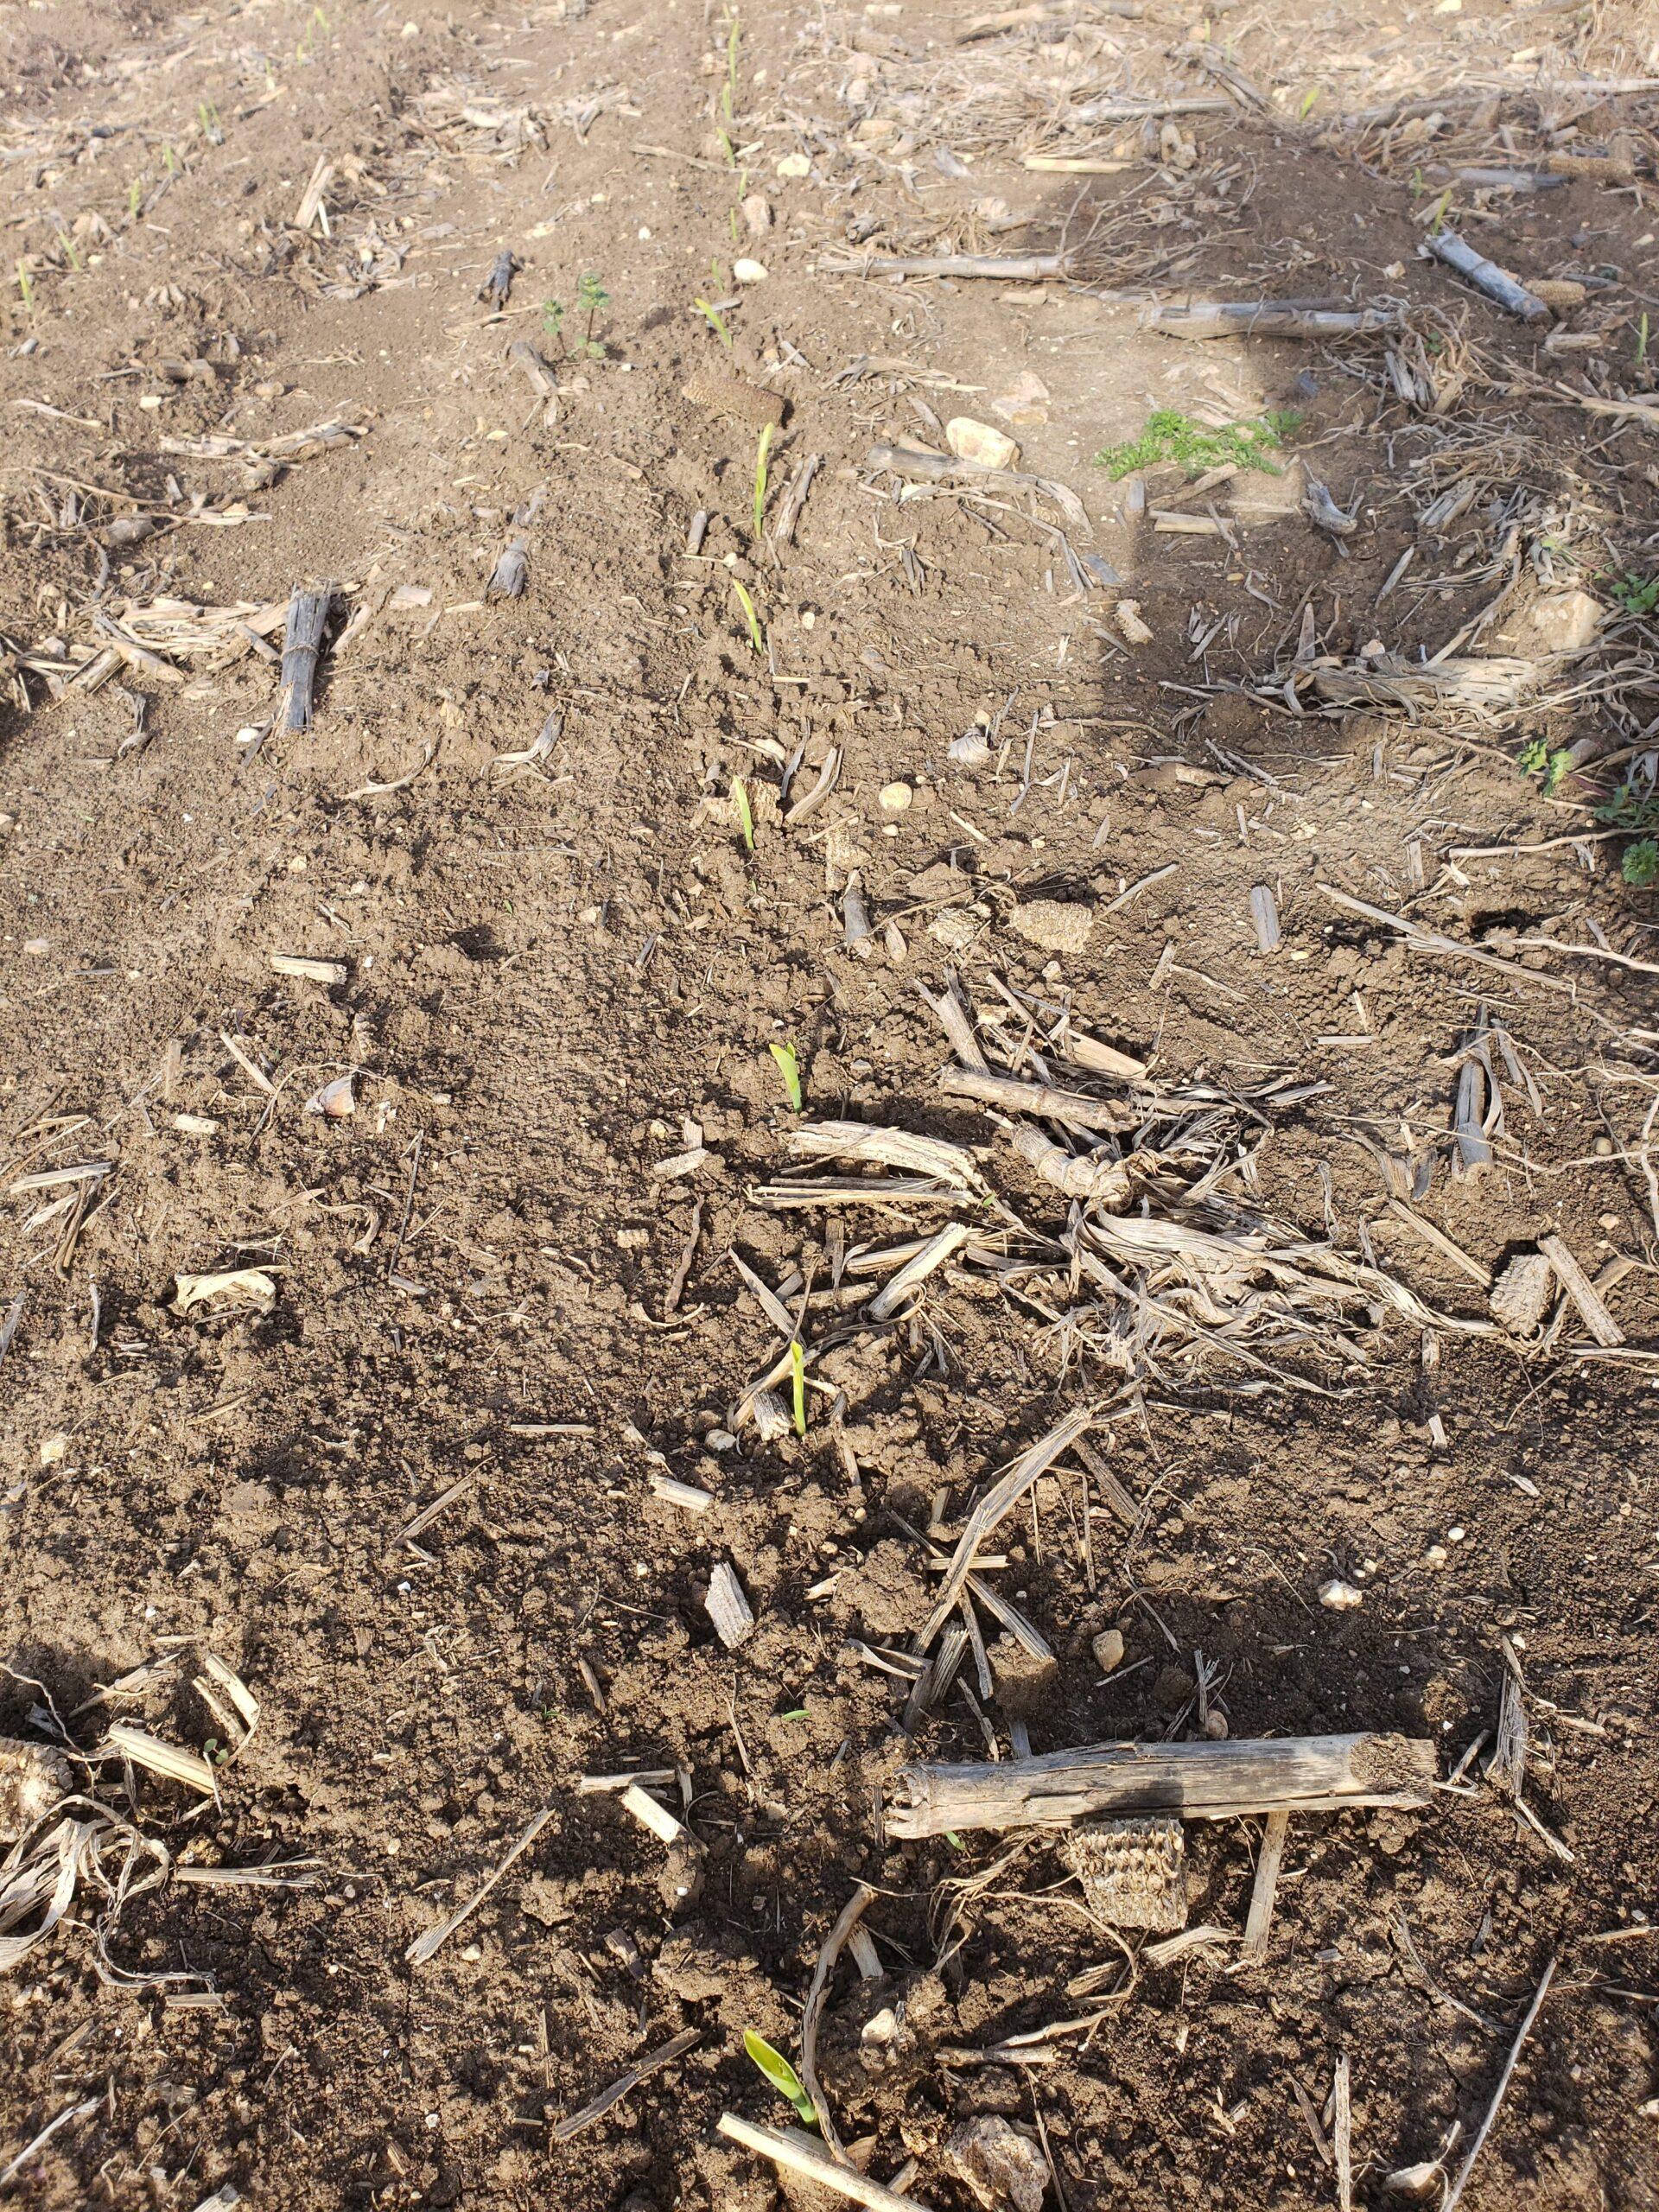 Corn planted with Germinator (Texas, 2020)